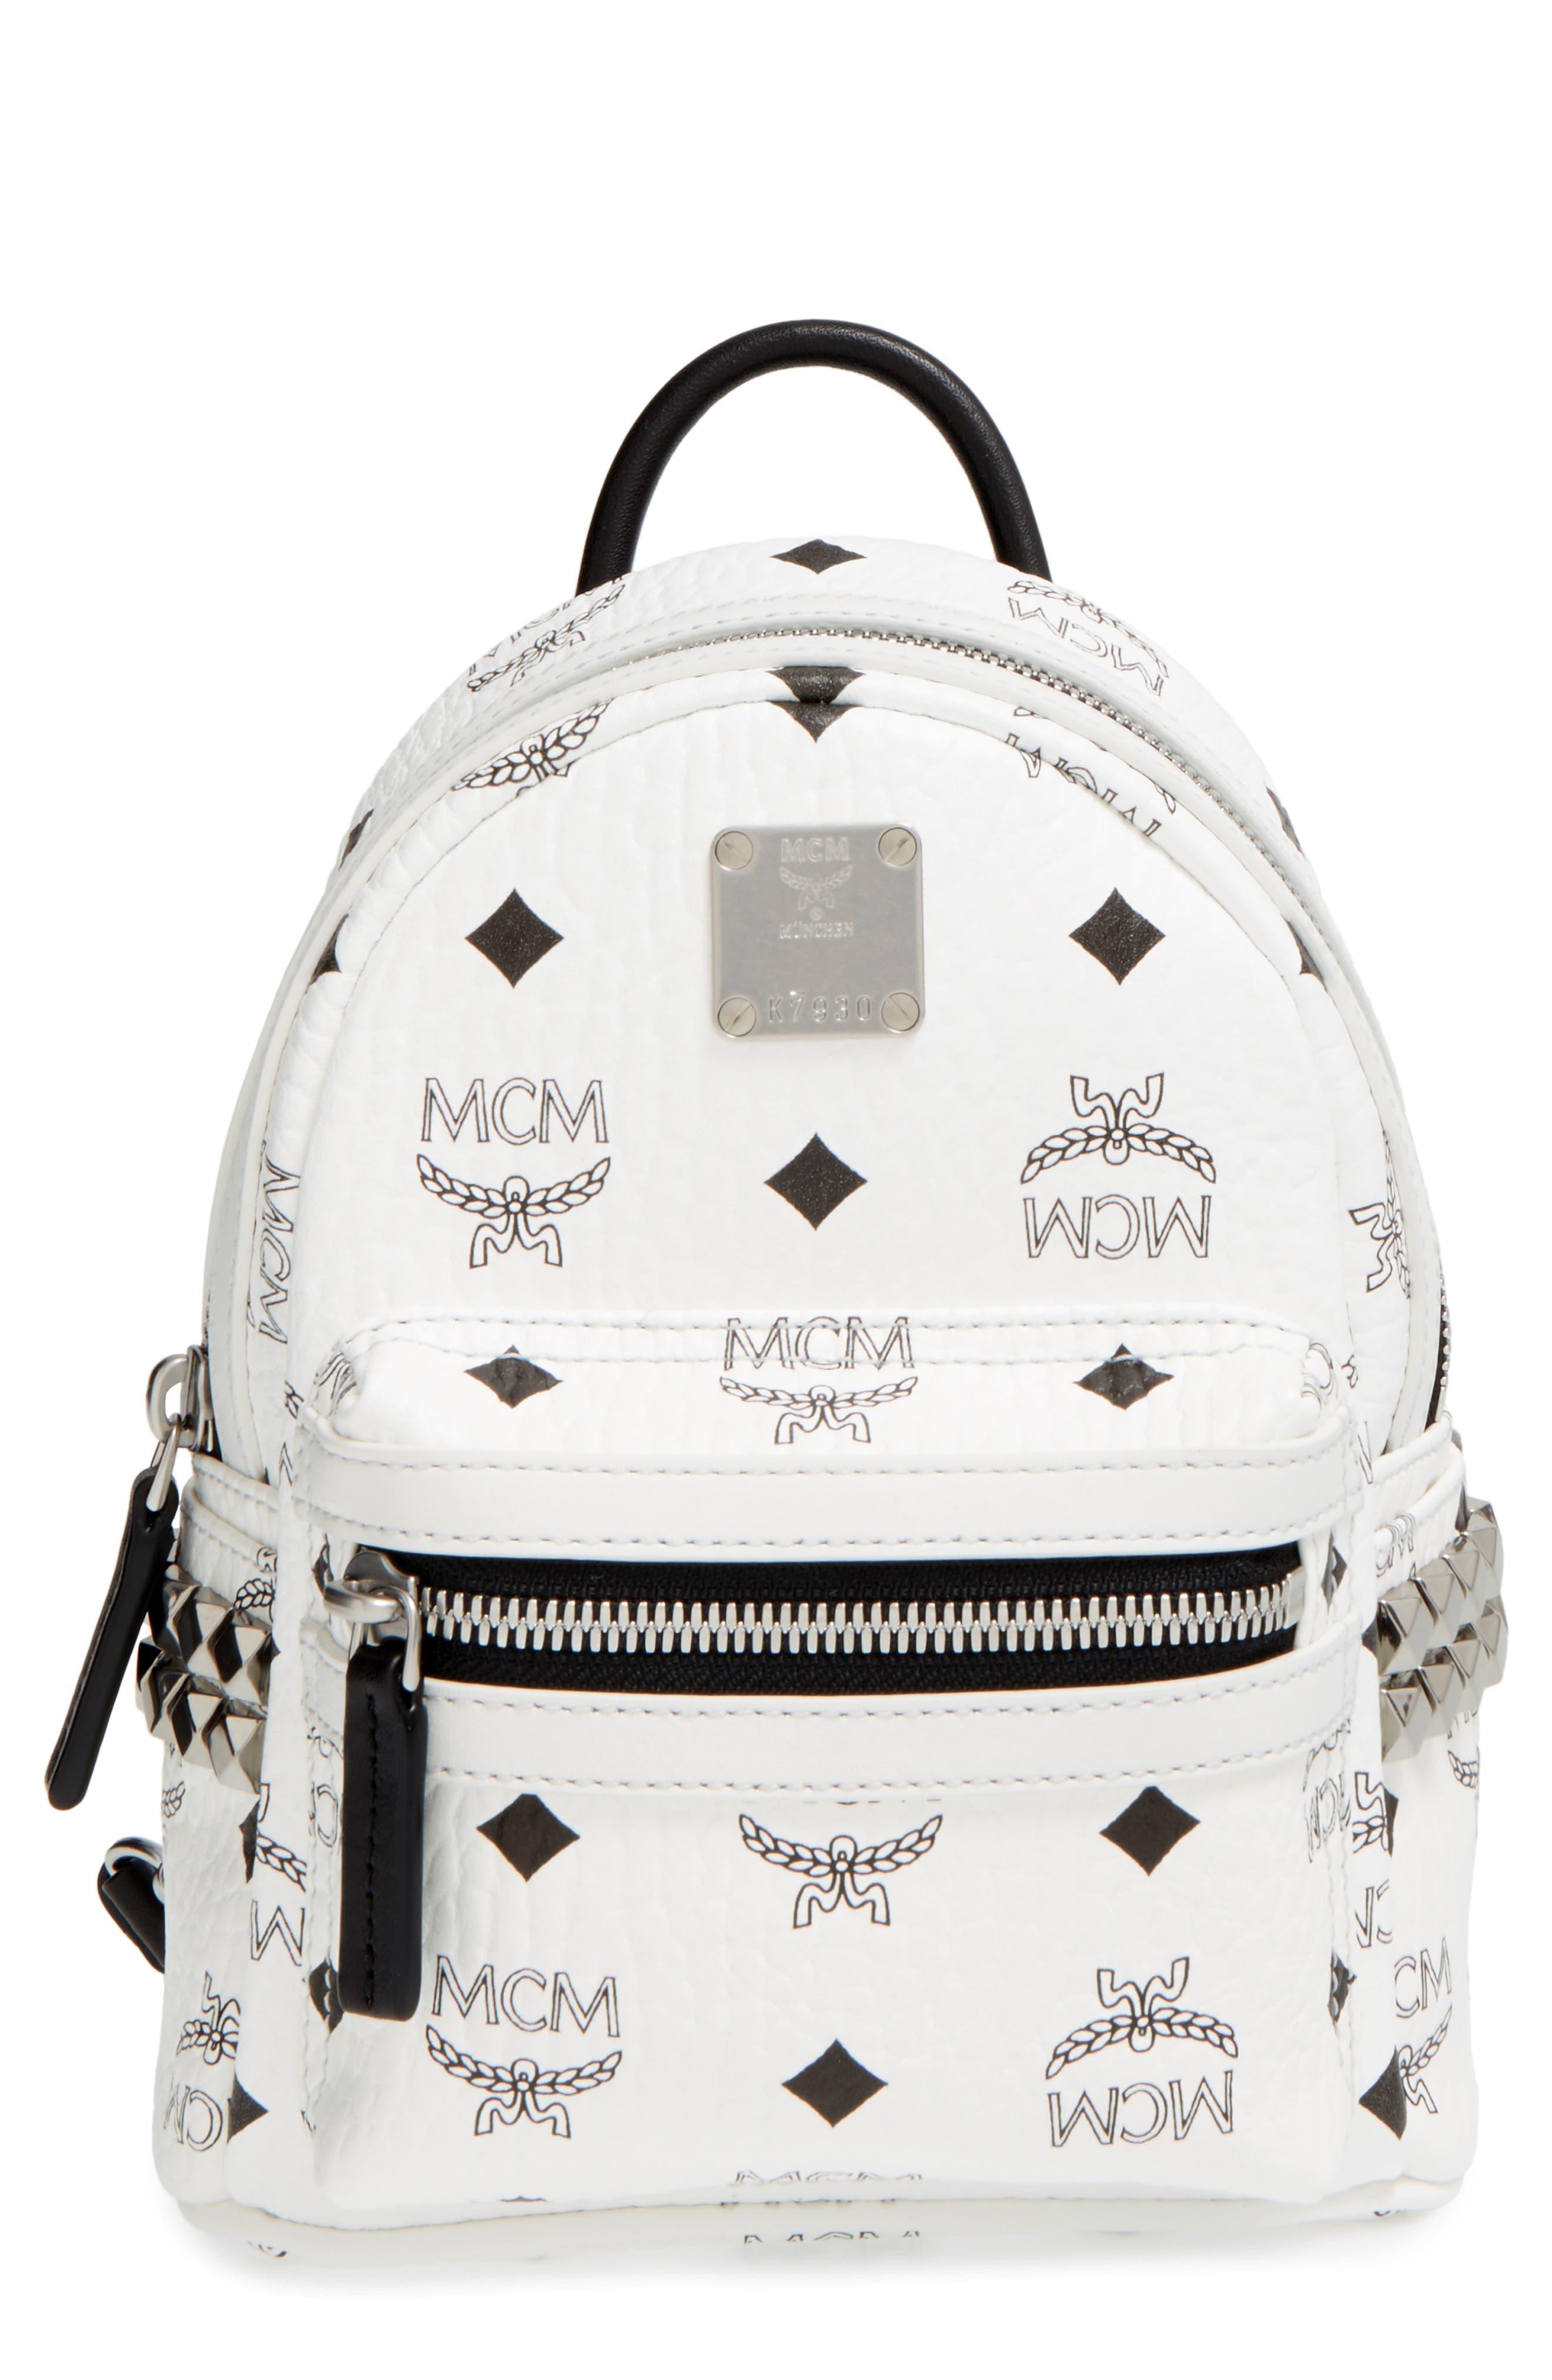 'X-Mini Stark Side Stud' Convertible Backpack,                             Main thumbnail 1, color,                             WHITE